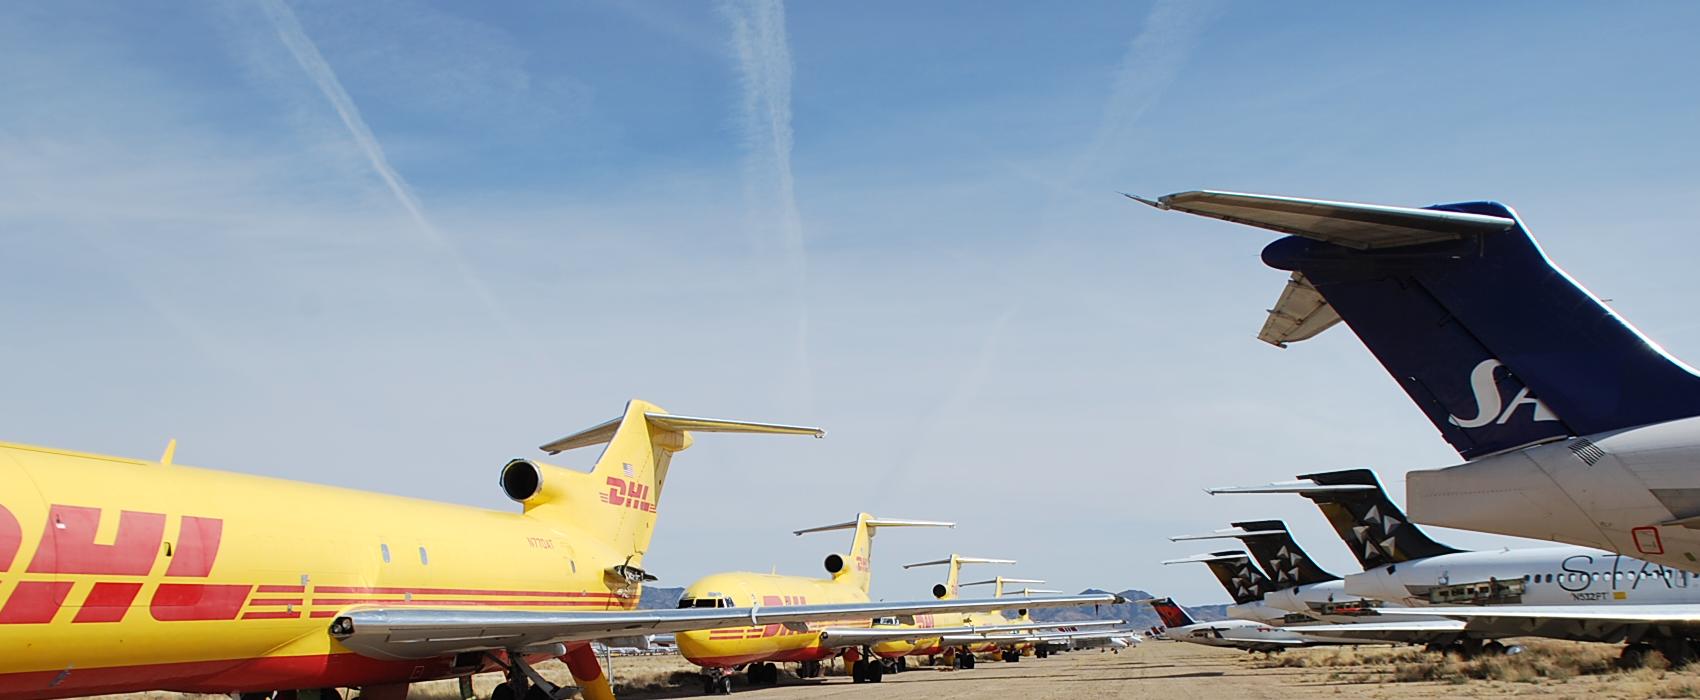 Kingman Aviation Parts, Arizona Airport, Airplane Tear Down